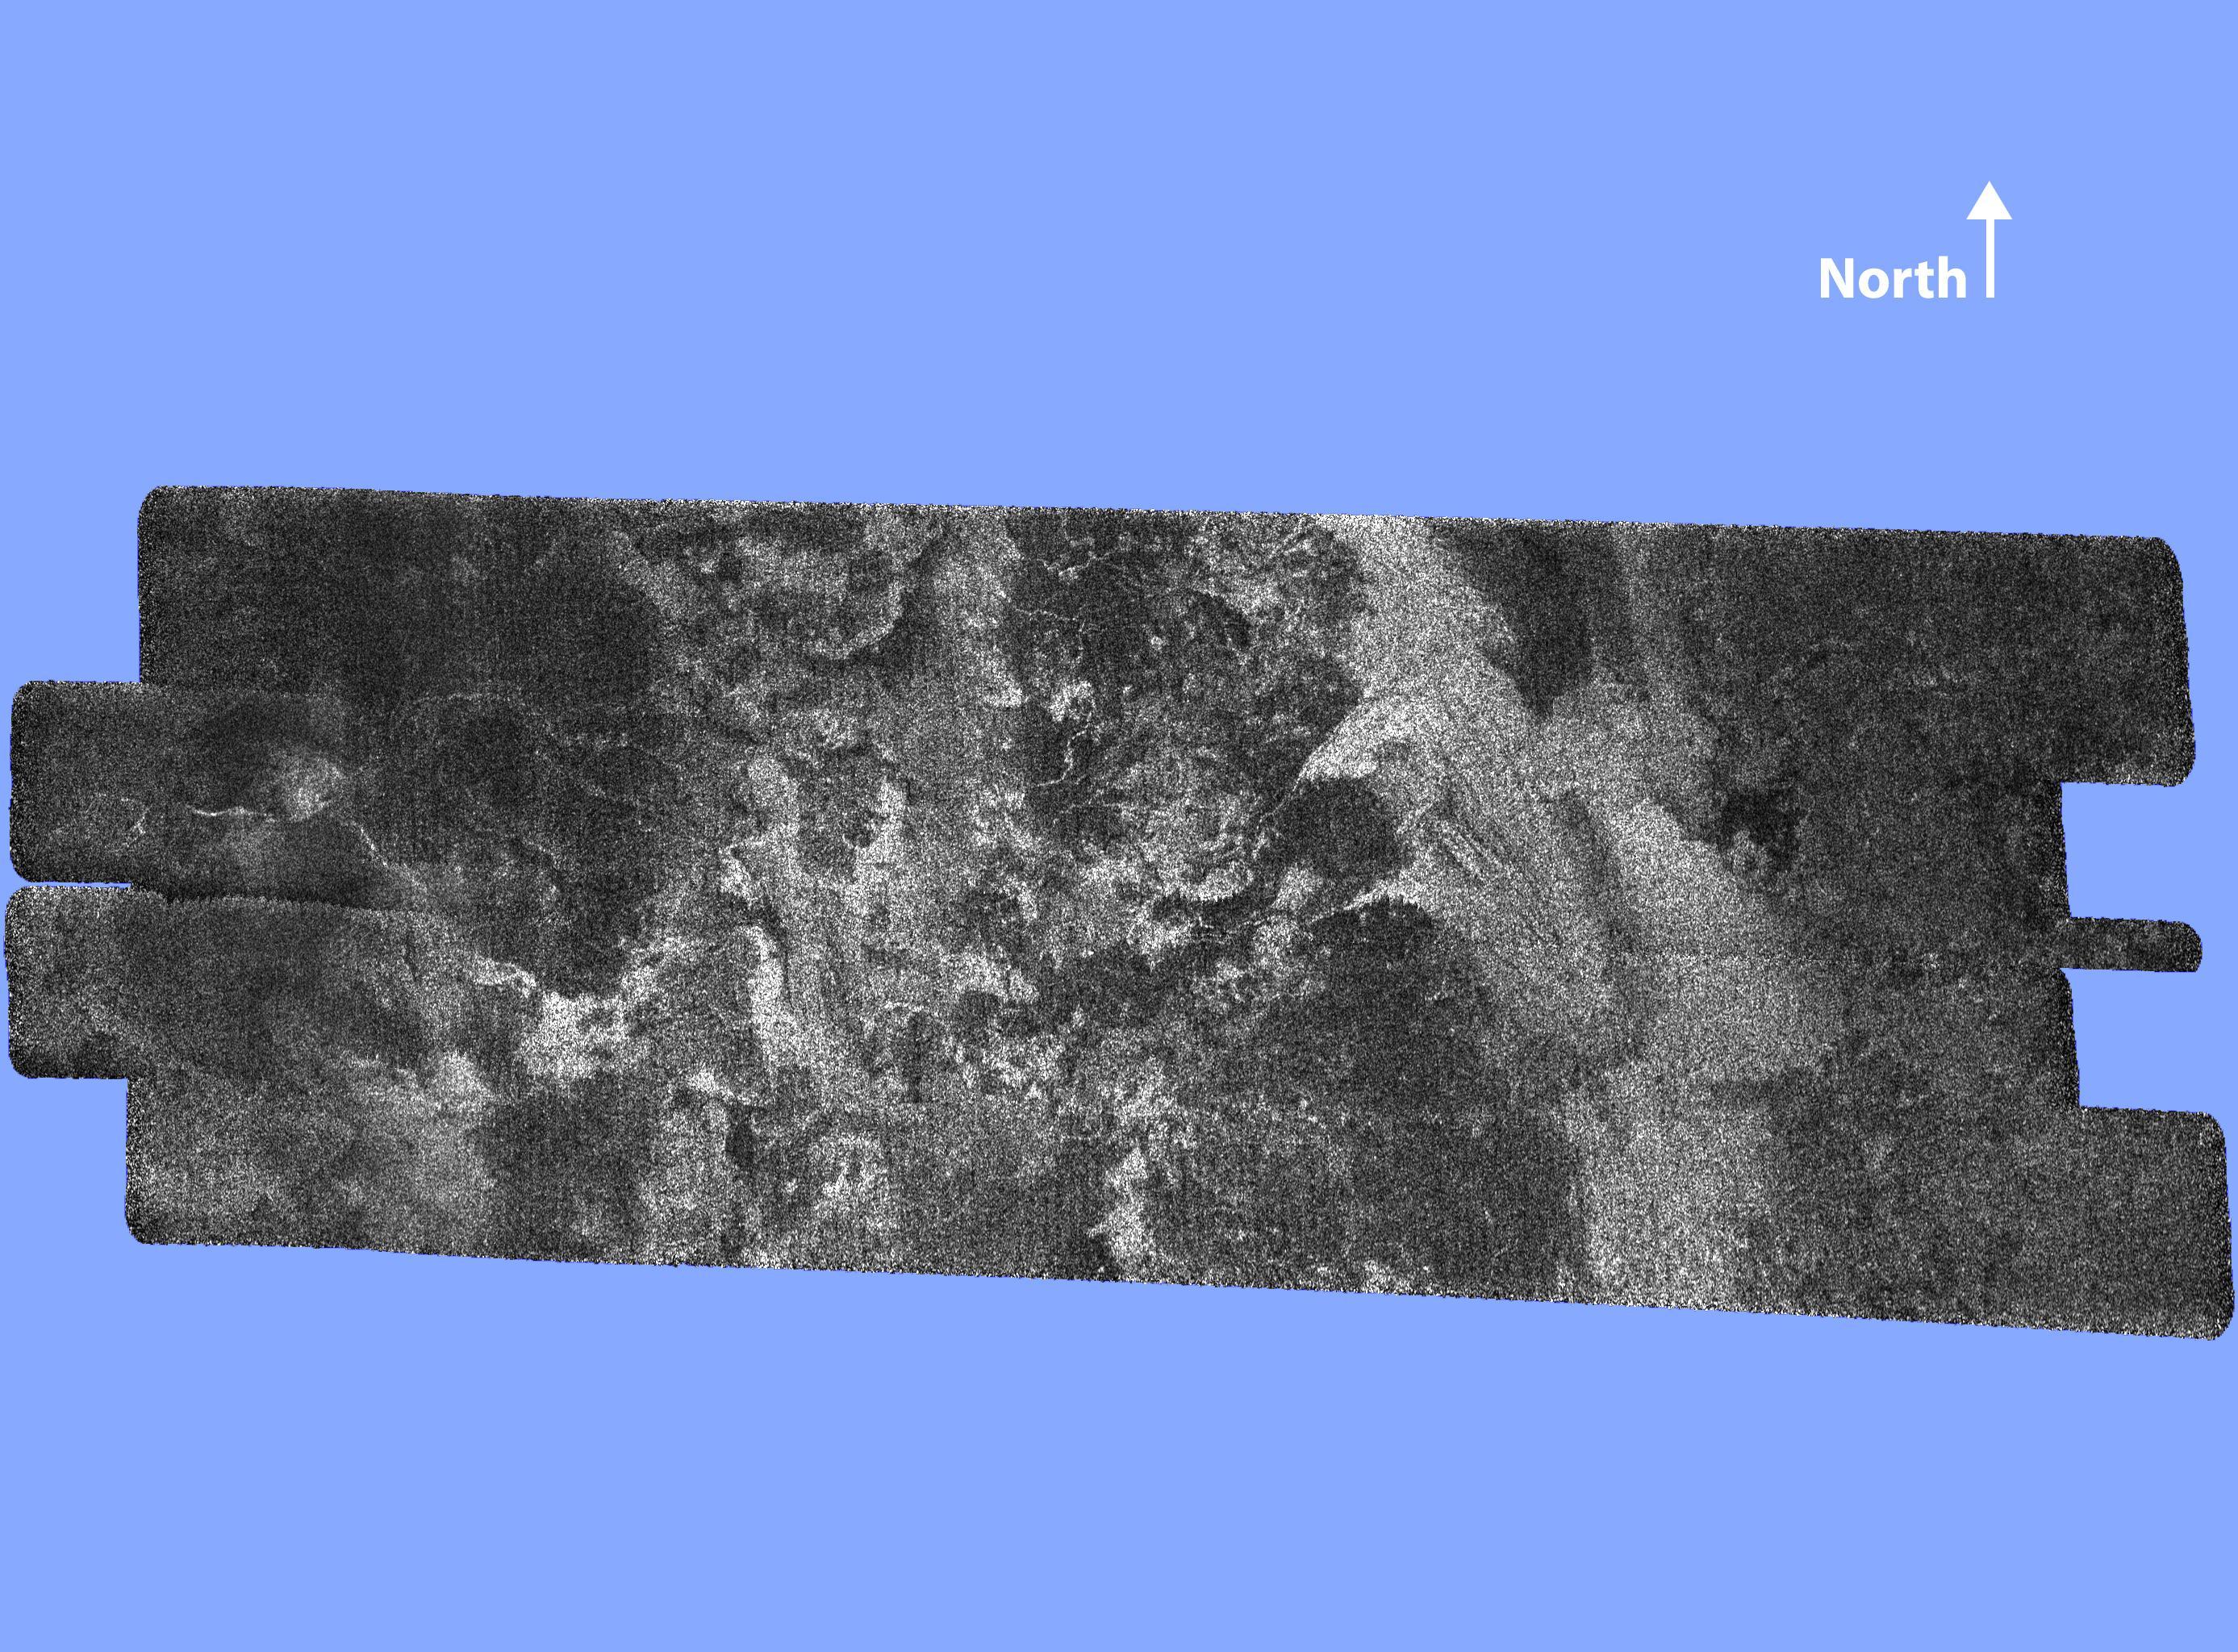 PIA06988, 25. Okt. 2004, Quelle: NASA/NPL